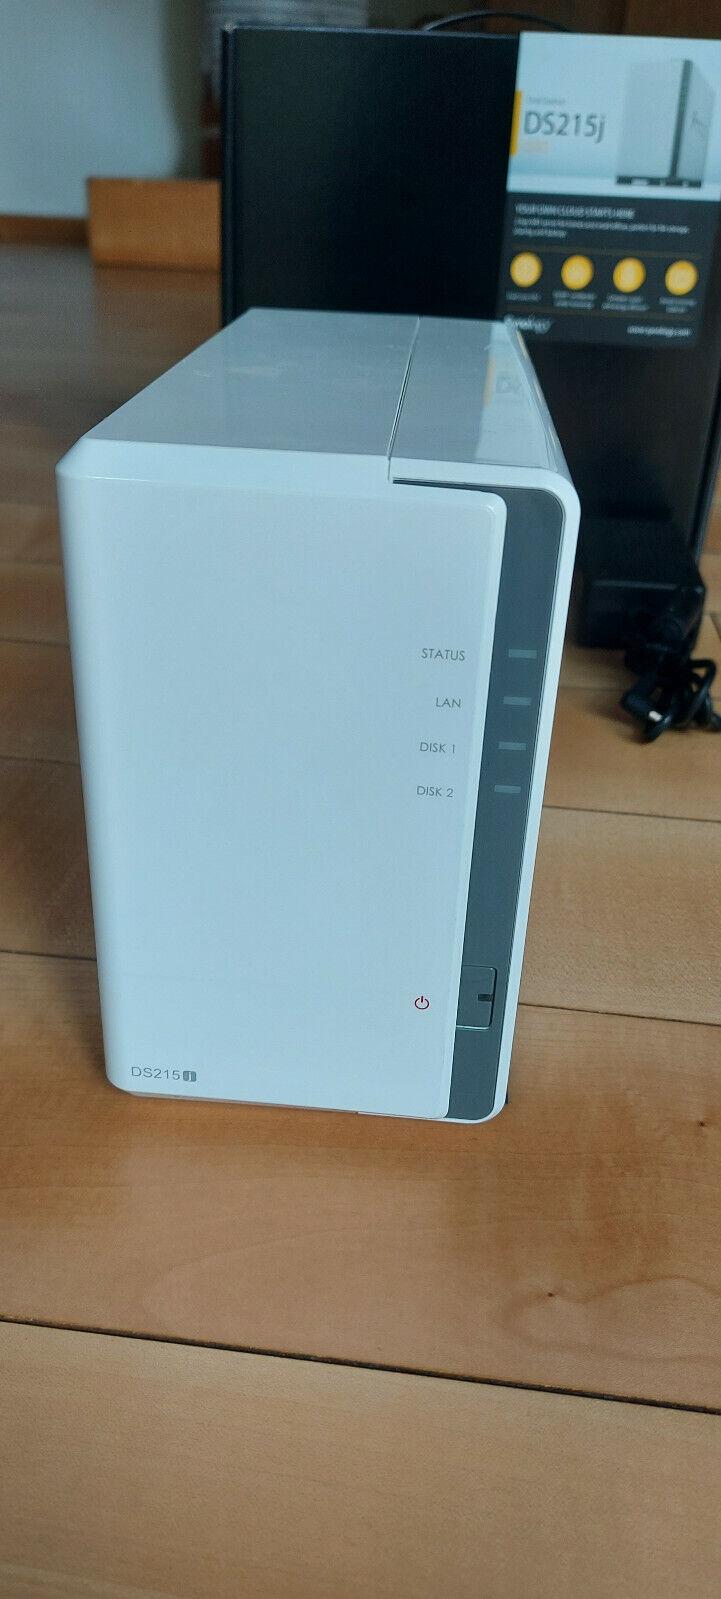 Synology DS215j 512MB RAM, 2-Bay NAS  mit  4TB (2x2)  Festplatten